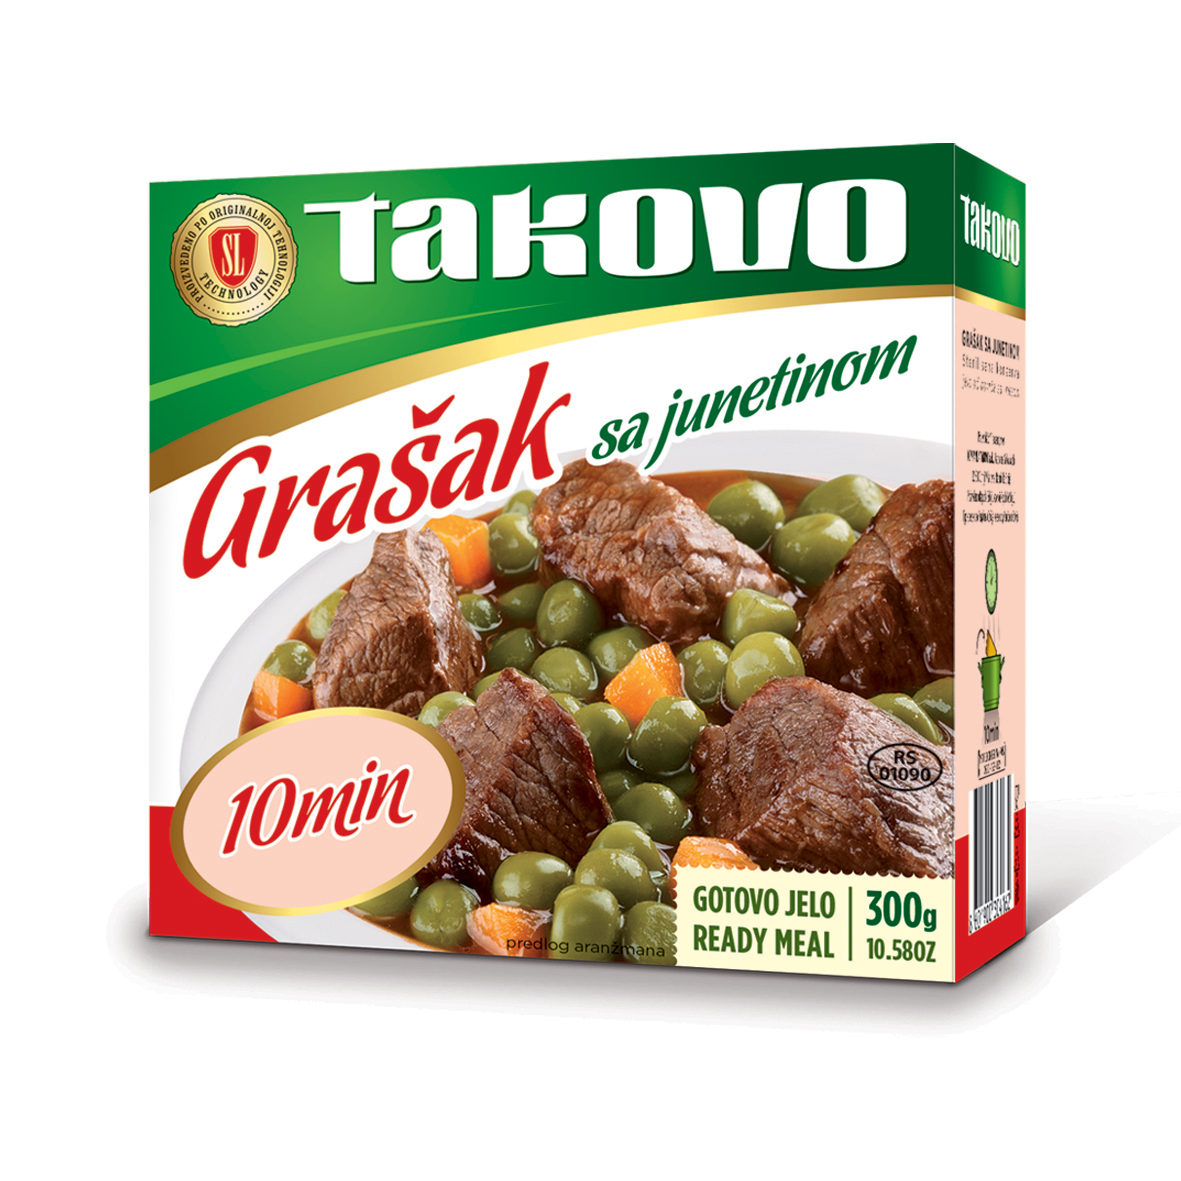 Grasak Sa Junetinom 300g